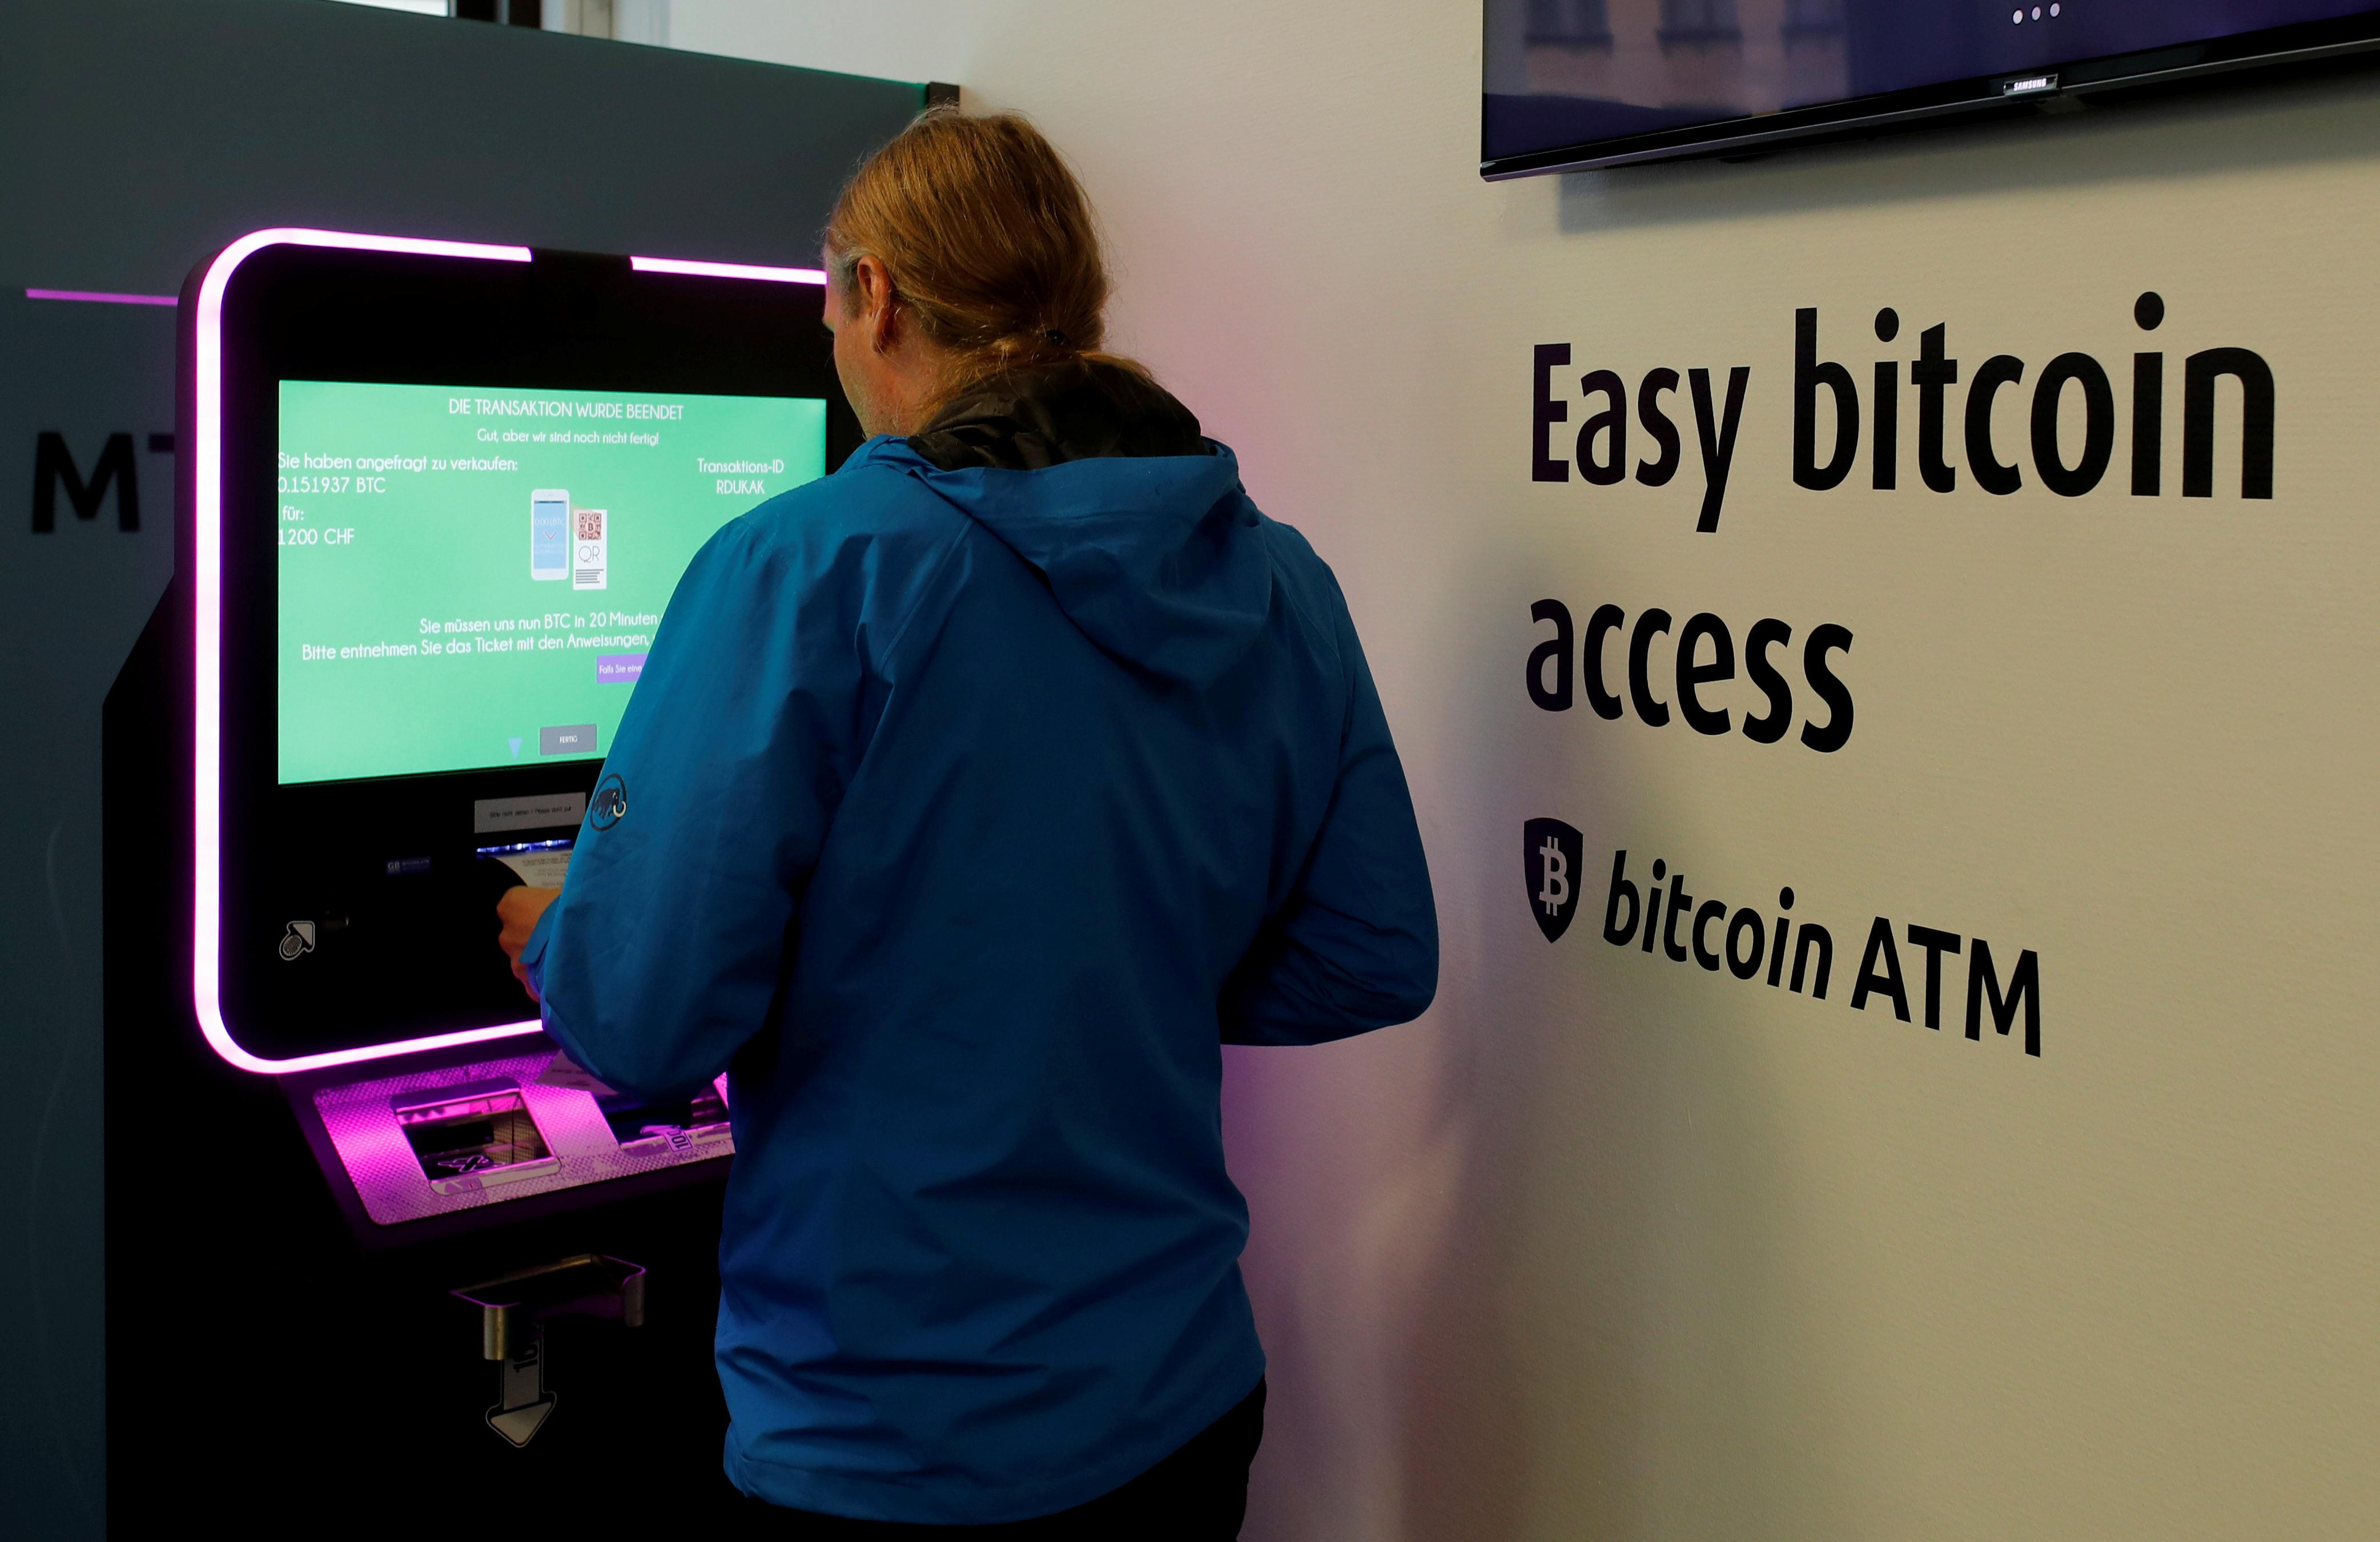 face bitcoin rapid 2020)